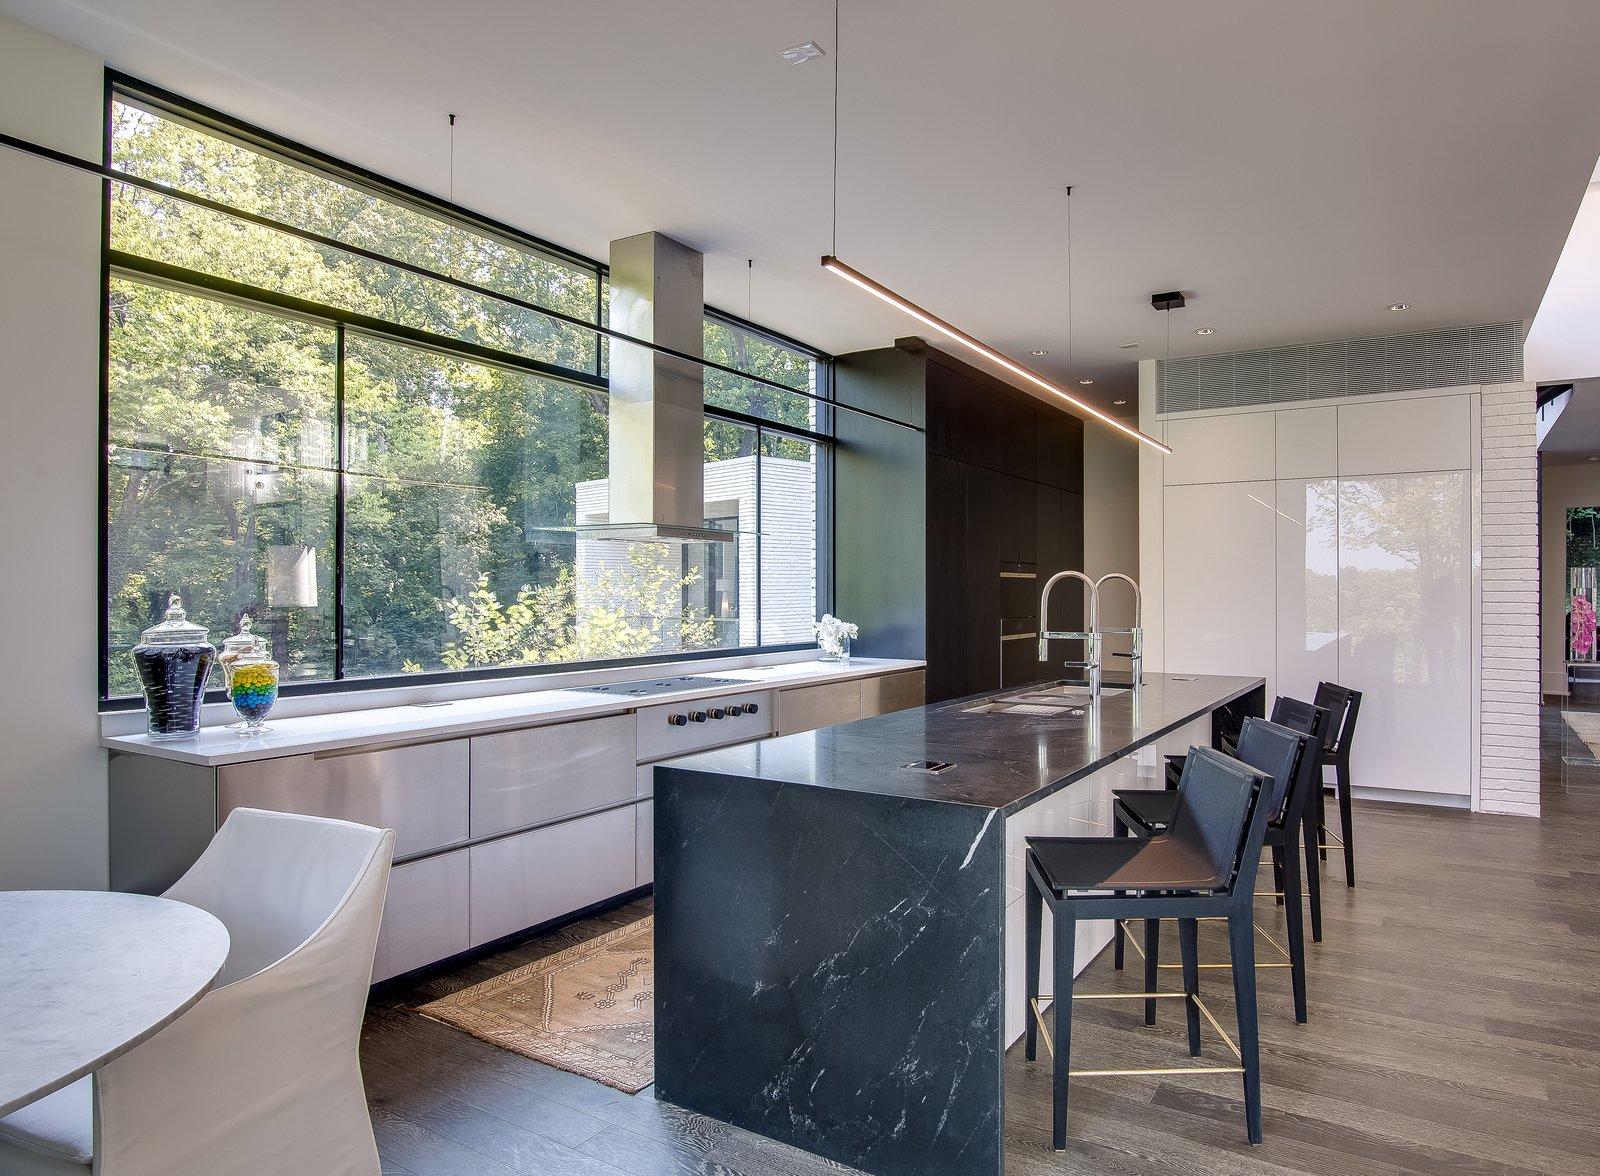 Kitchen, Granite Counter, Refrigerator, Metal Cabinet, Range, Undermount Sink, Cooktops, Dark Hardwood Floor, Range Hood, White Cabinet, Wall Oven, Pendant Lighting, and Marble Counter  Modern View